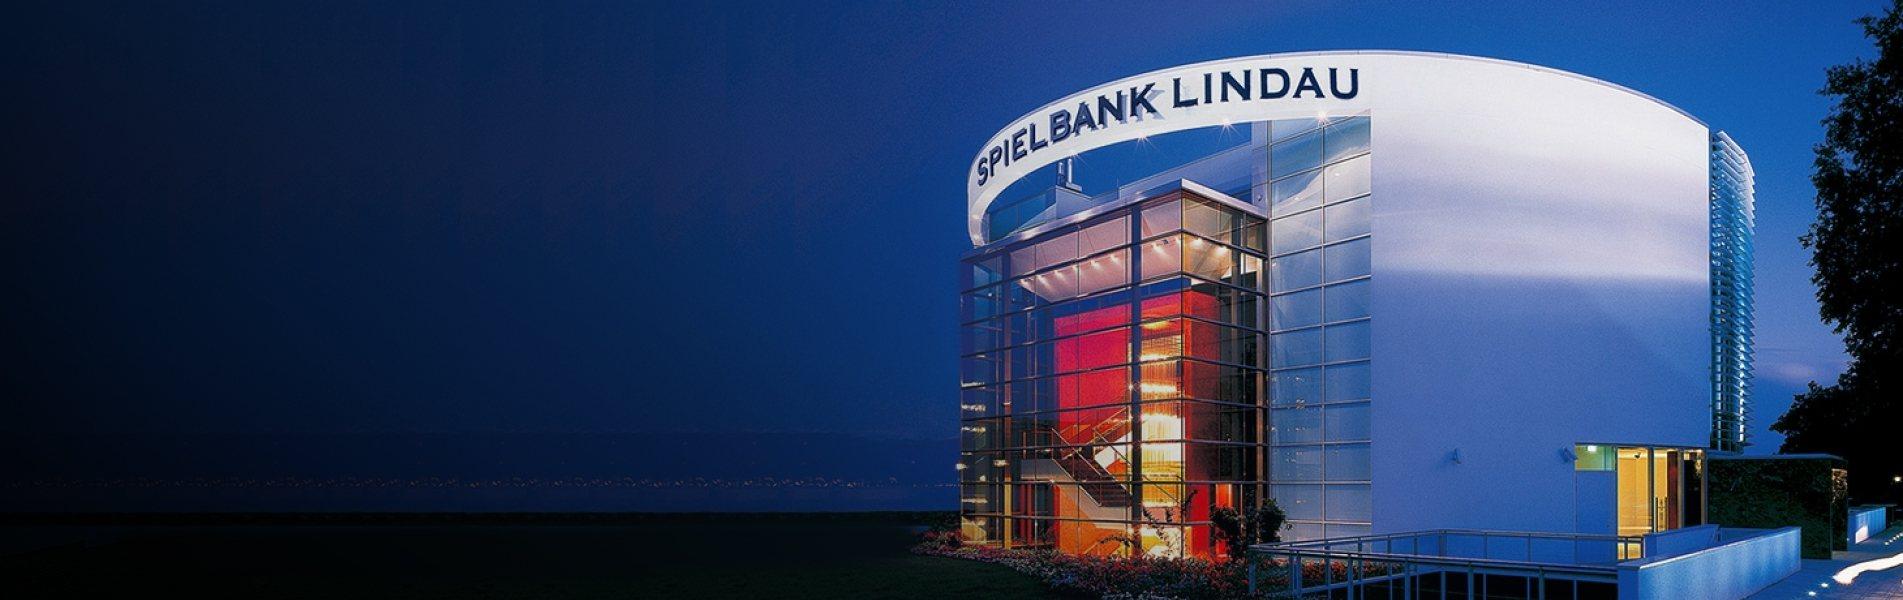 Spielbank Lindau in Bayern - Roulette Ratgeber